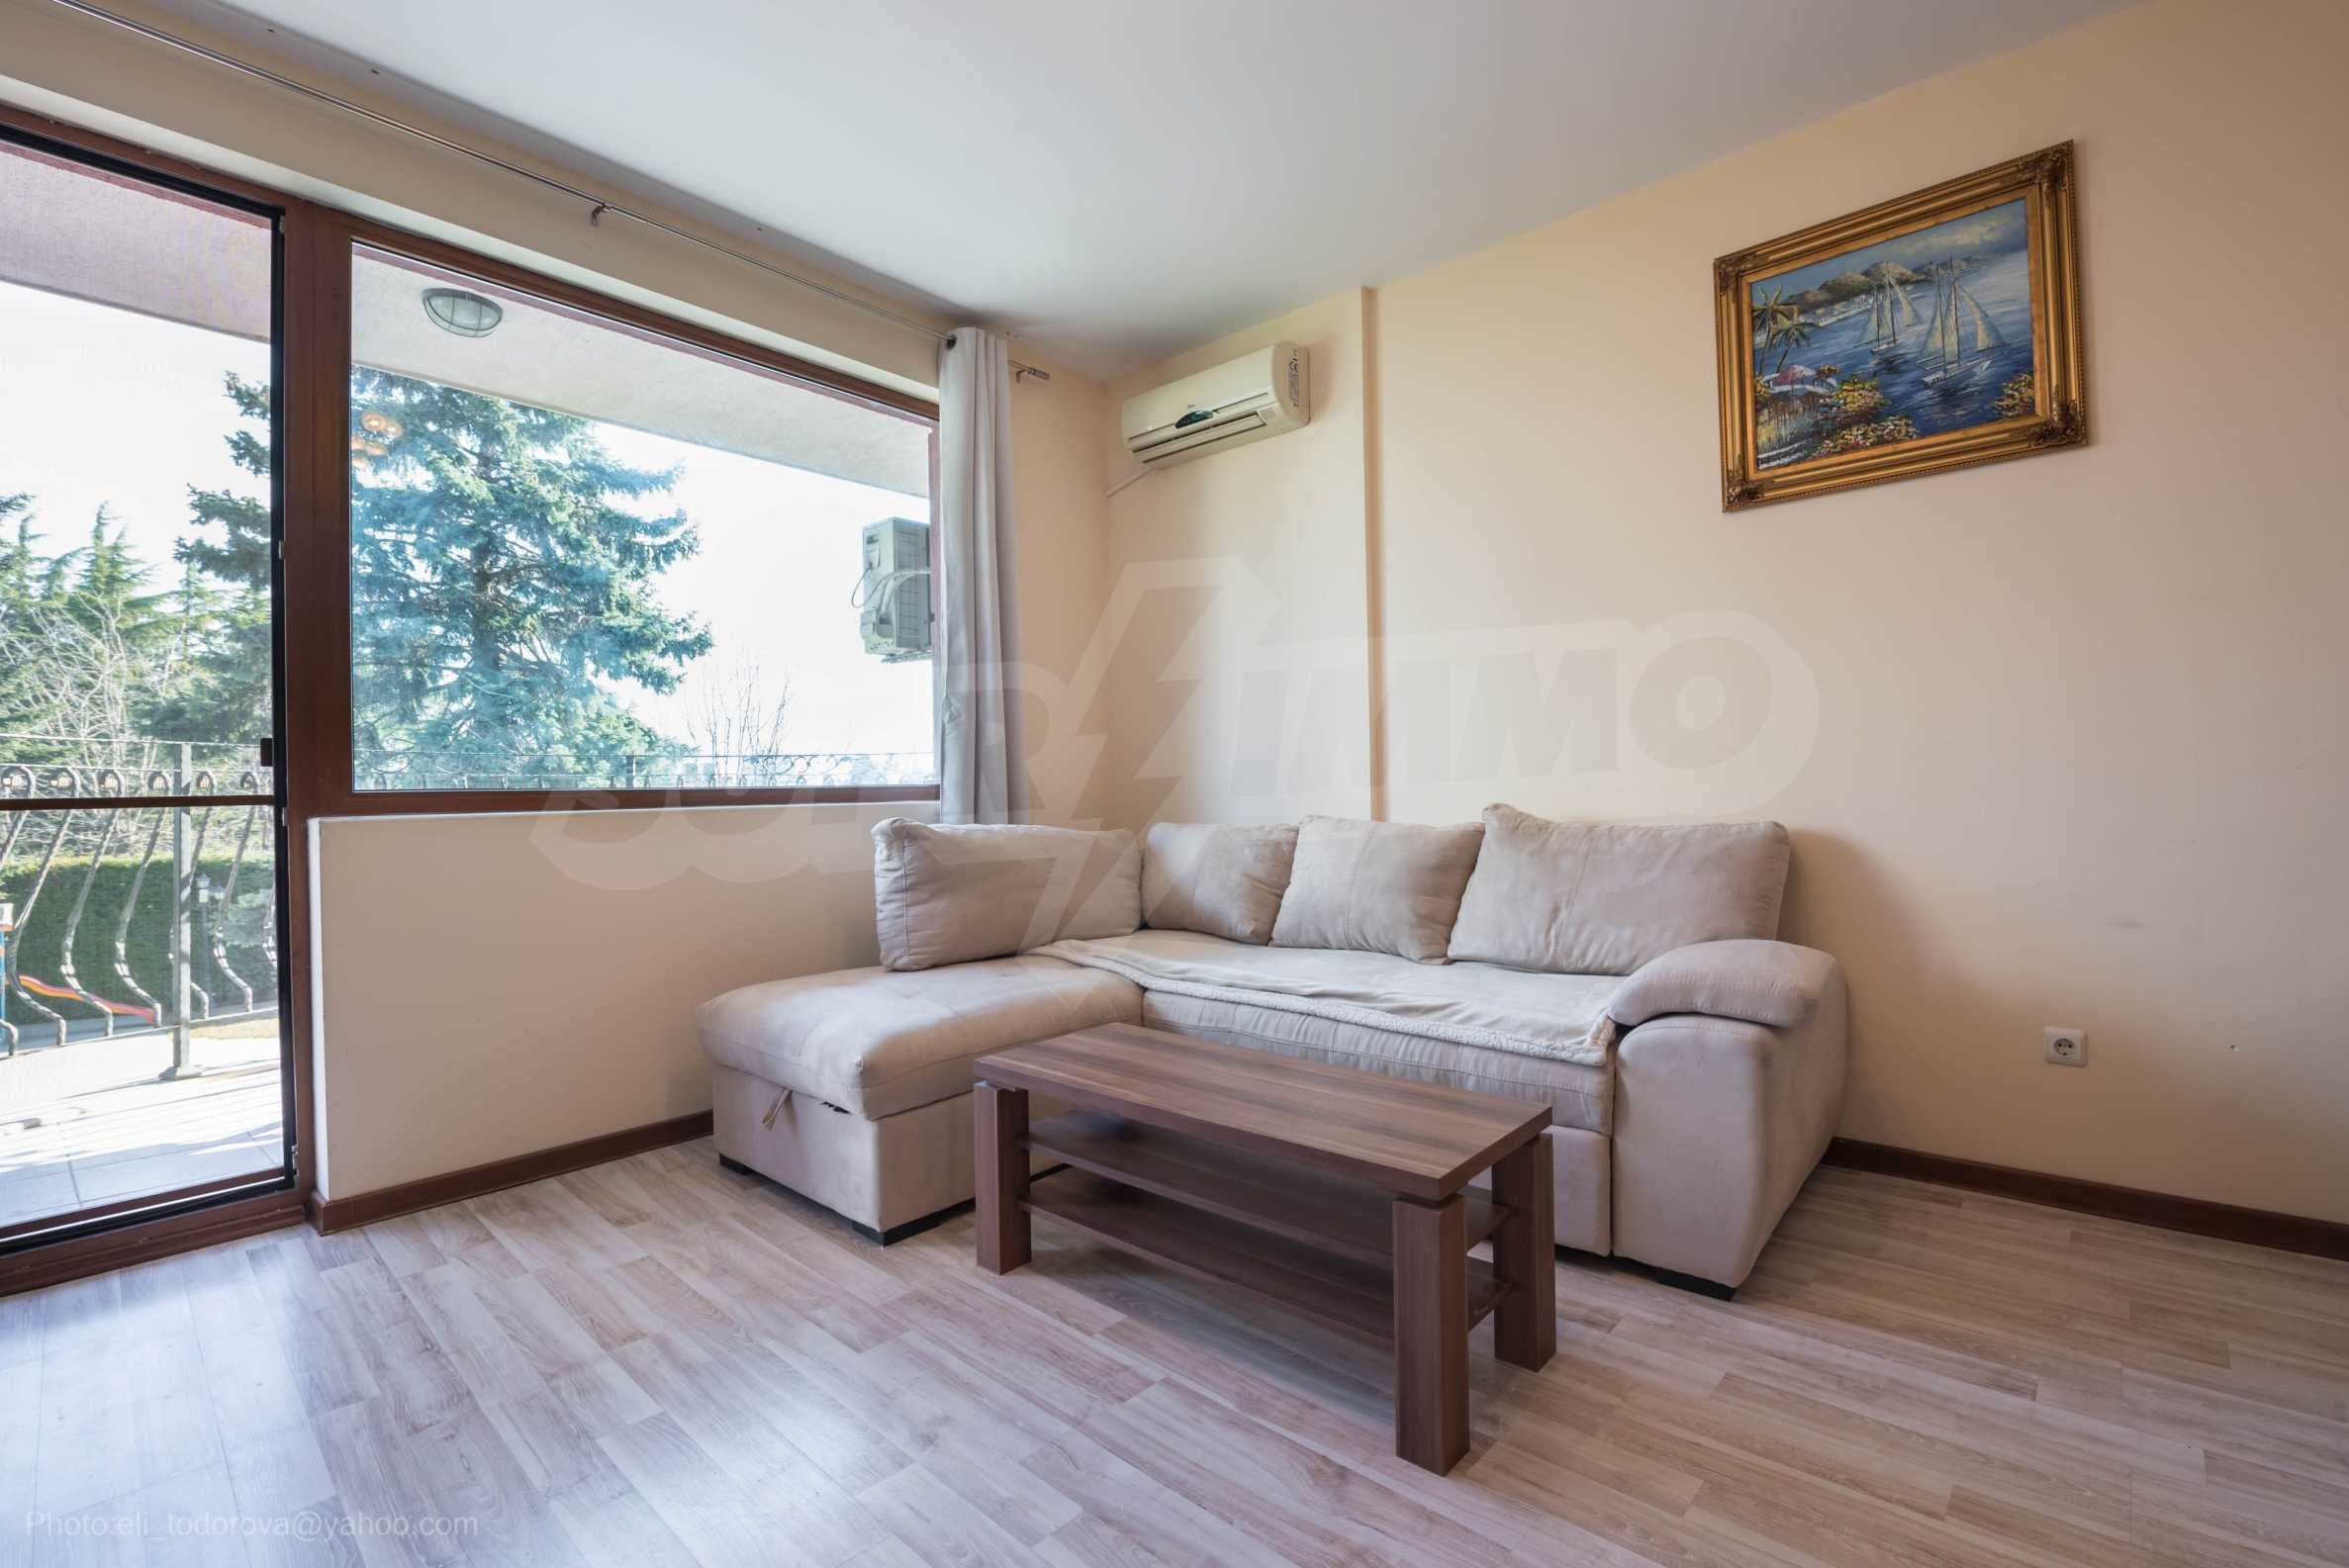 Квартира в аренду в Варне 1